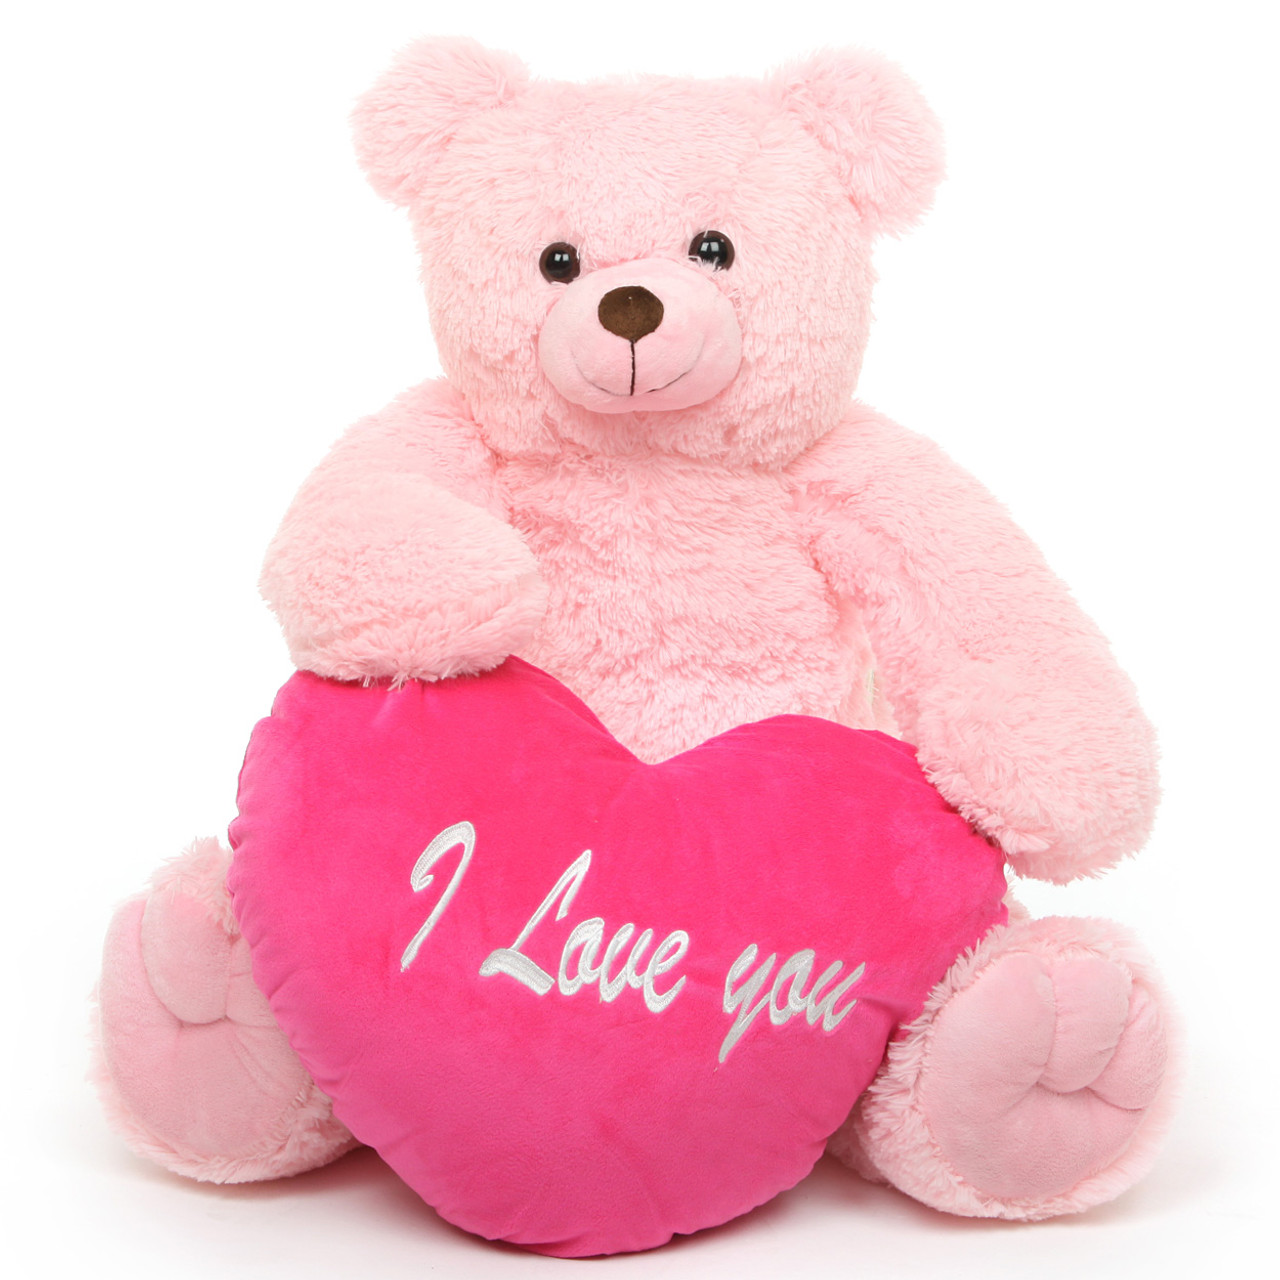 Darling heart tubs 32 pink teddy bear w i love you heart giant darling heart tubs i love you heart pink teddy bear 32in altavistaventures Images